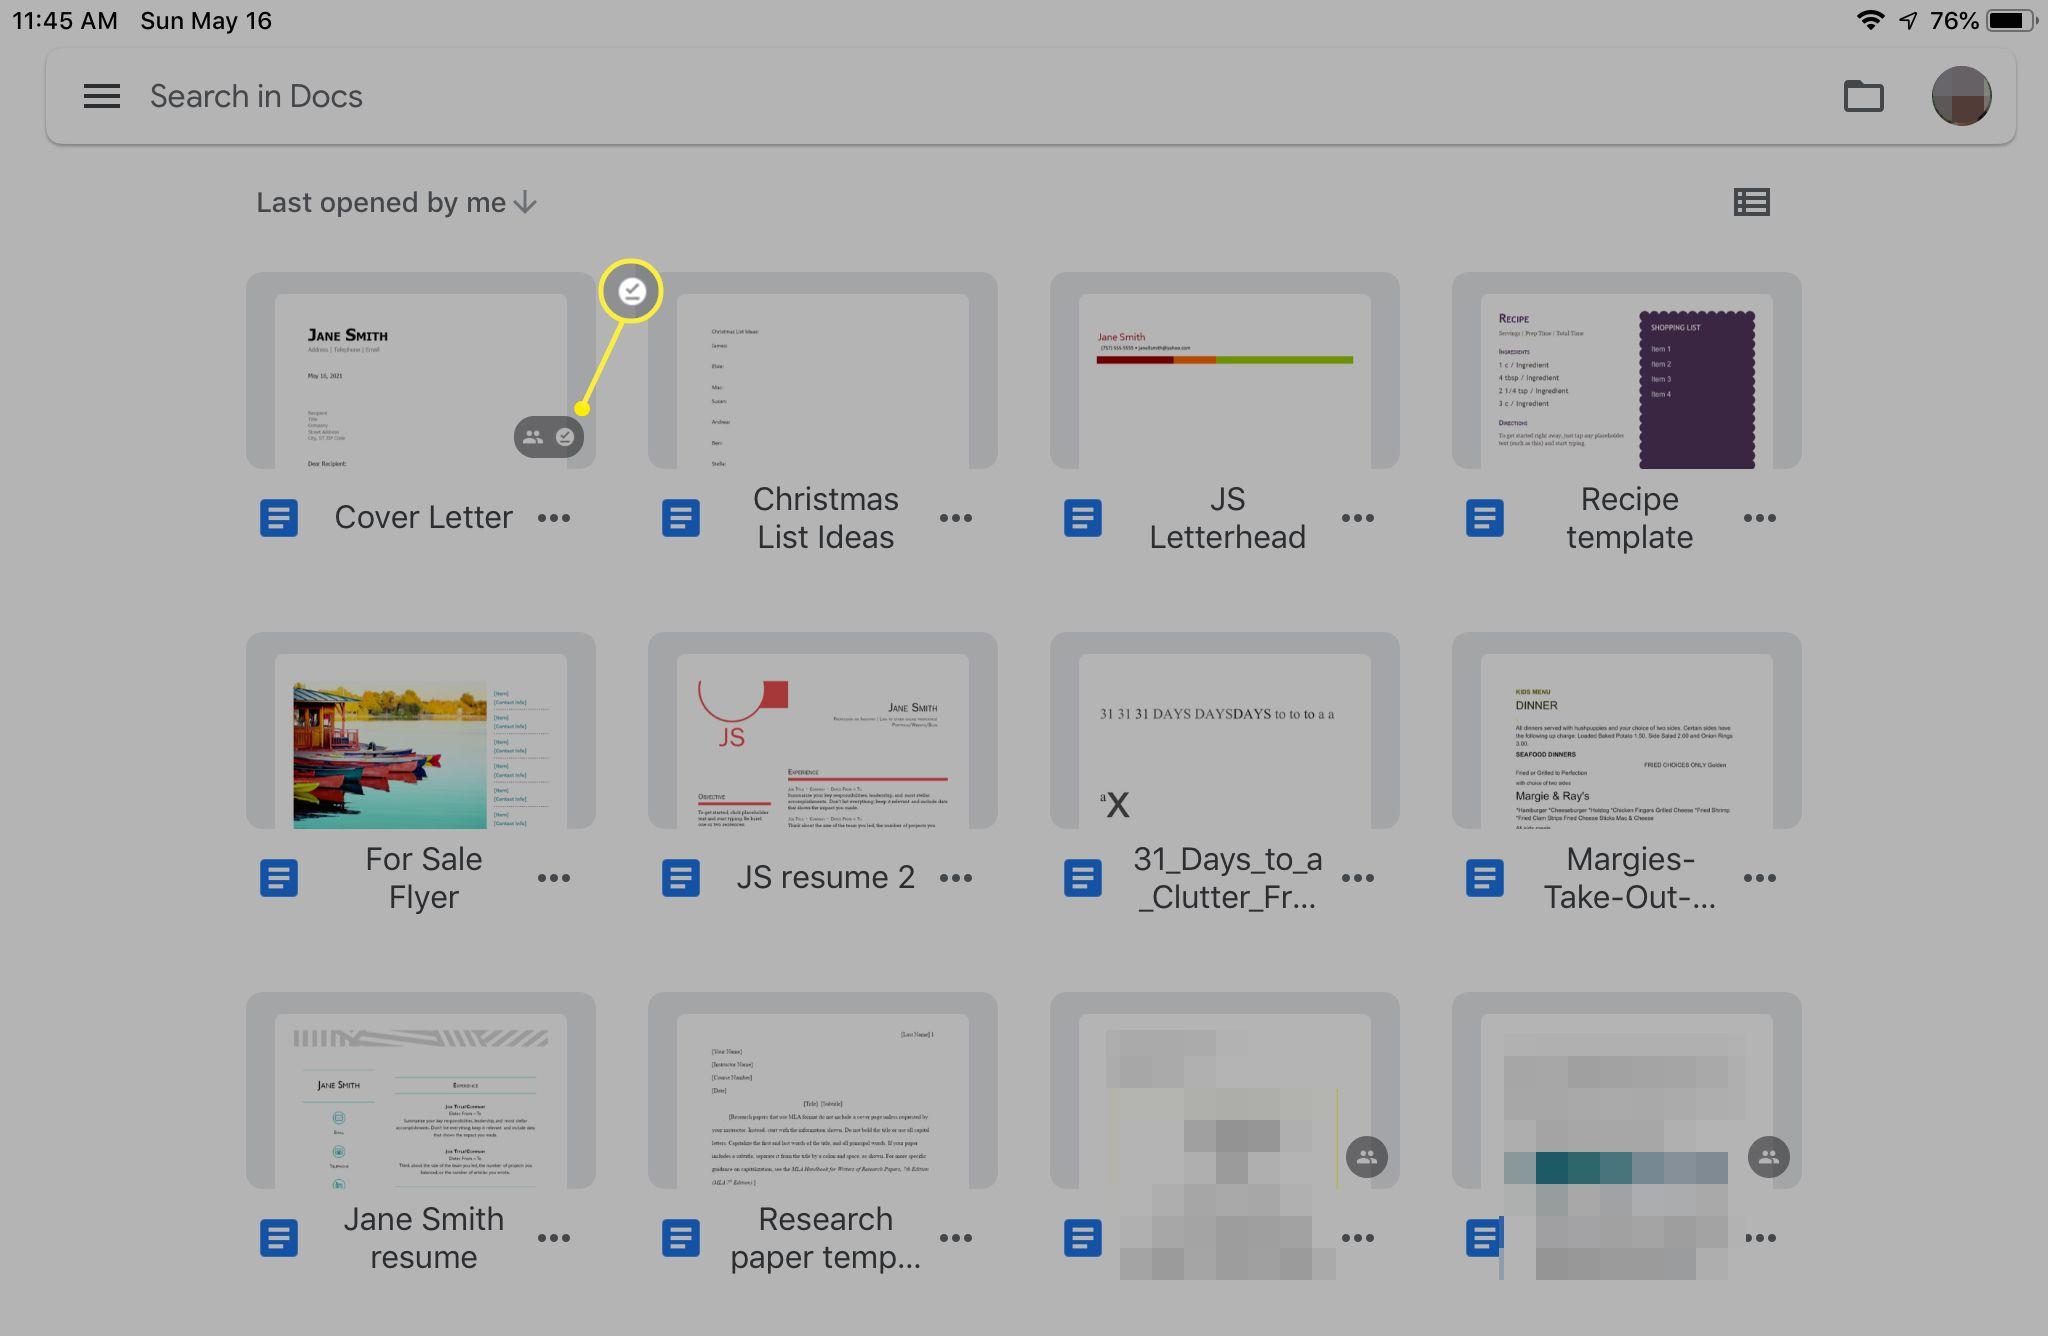 Google Docs iPad app showing available offline badge